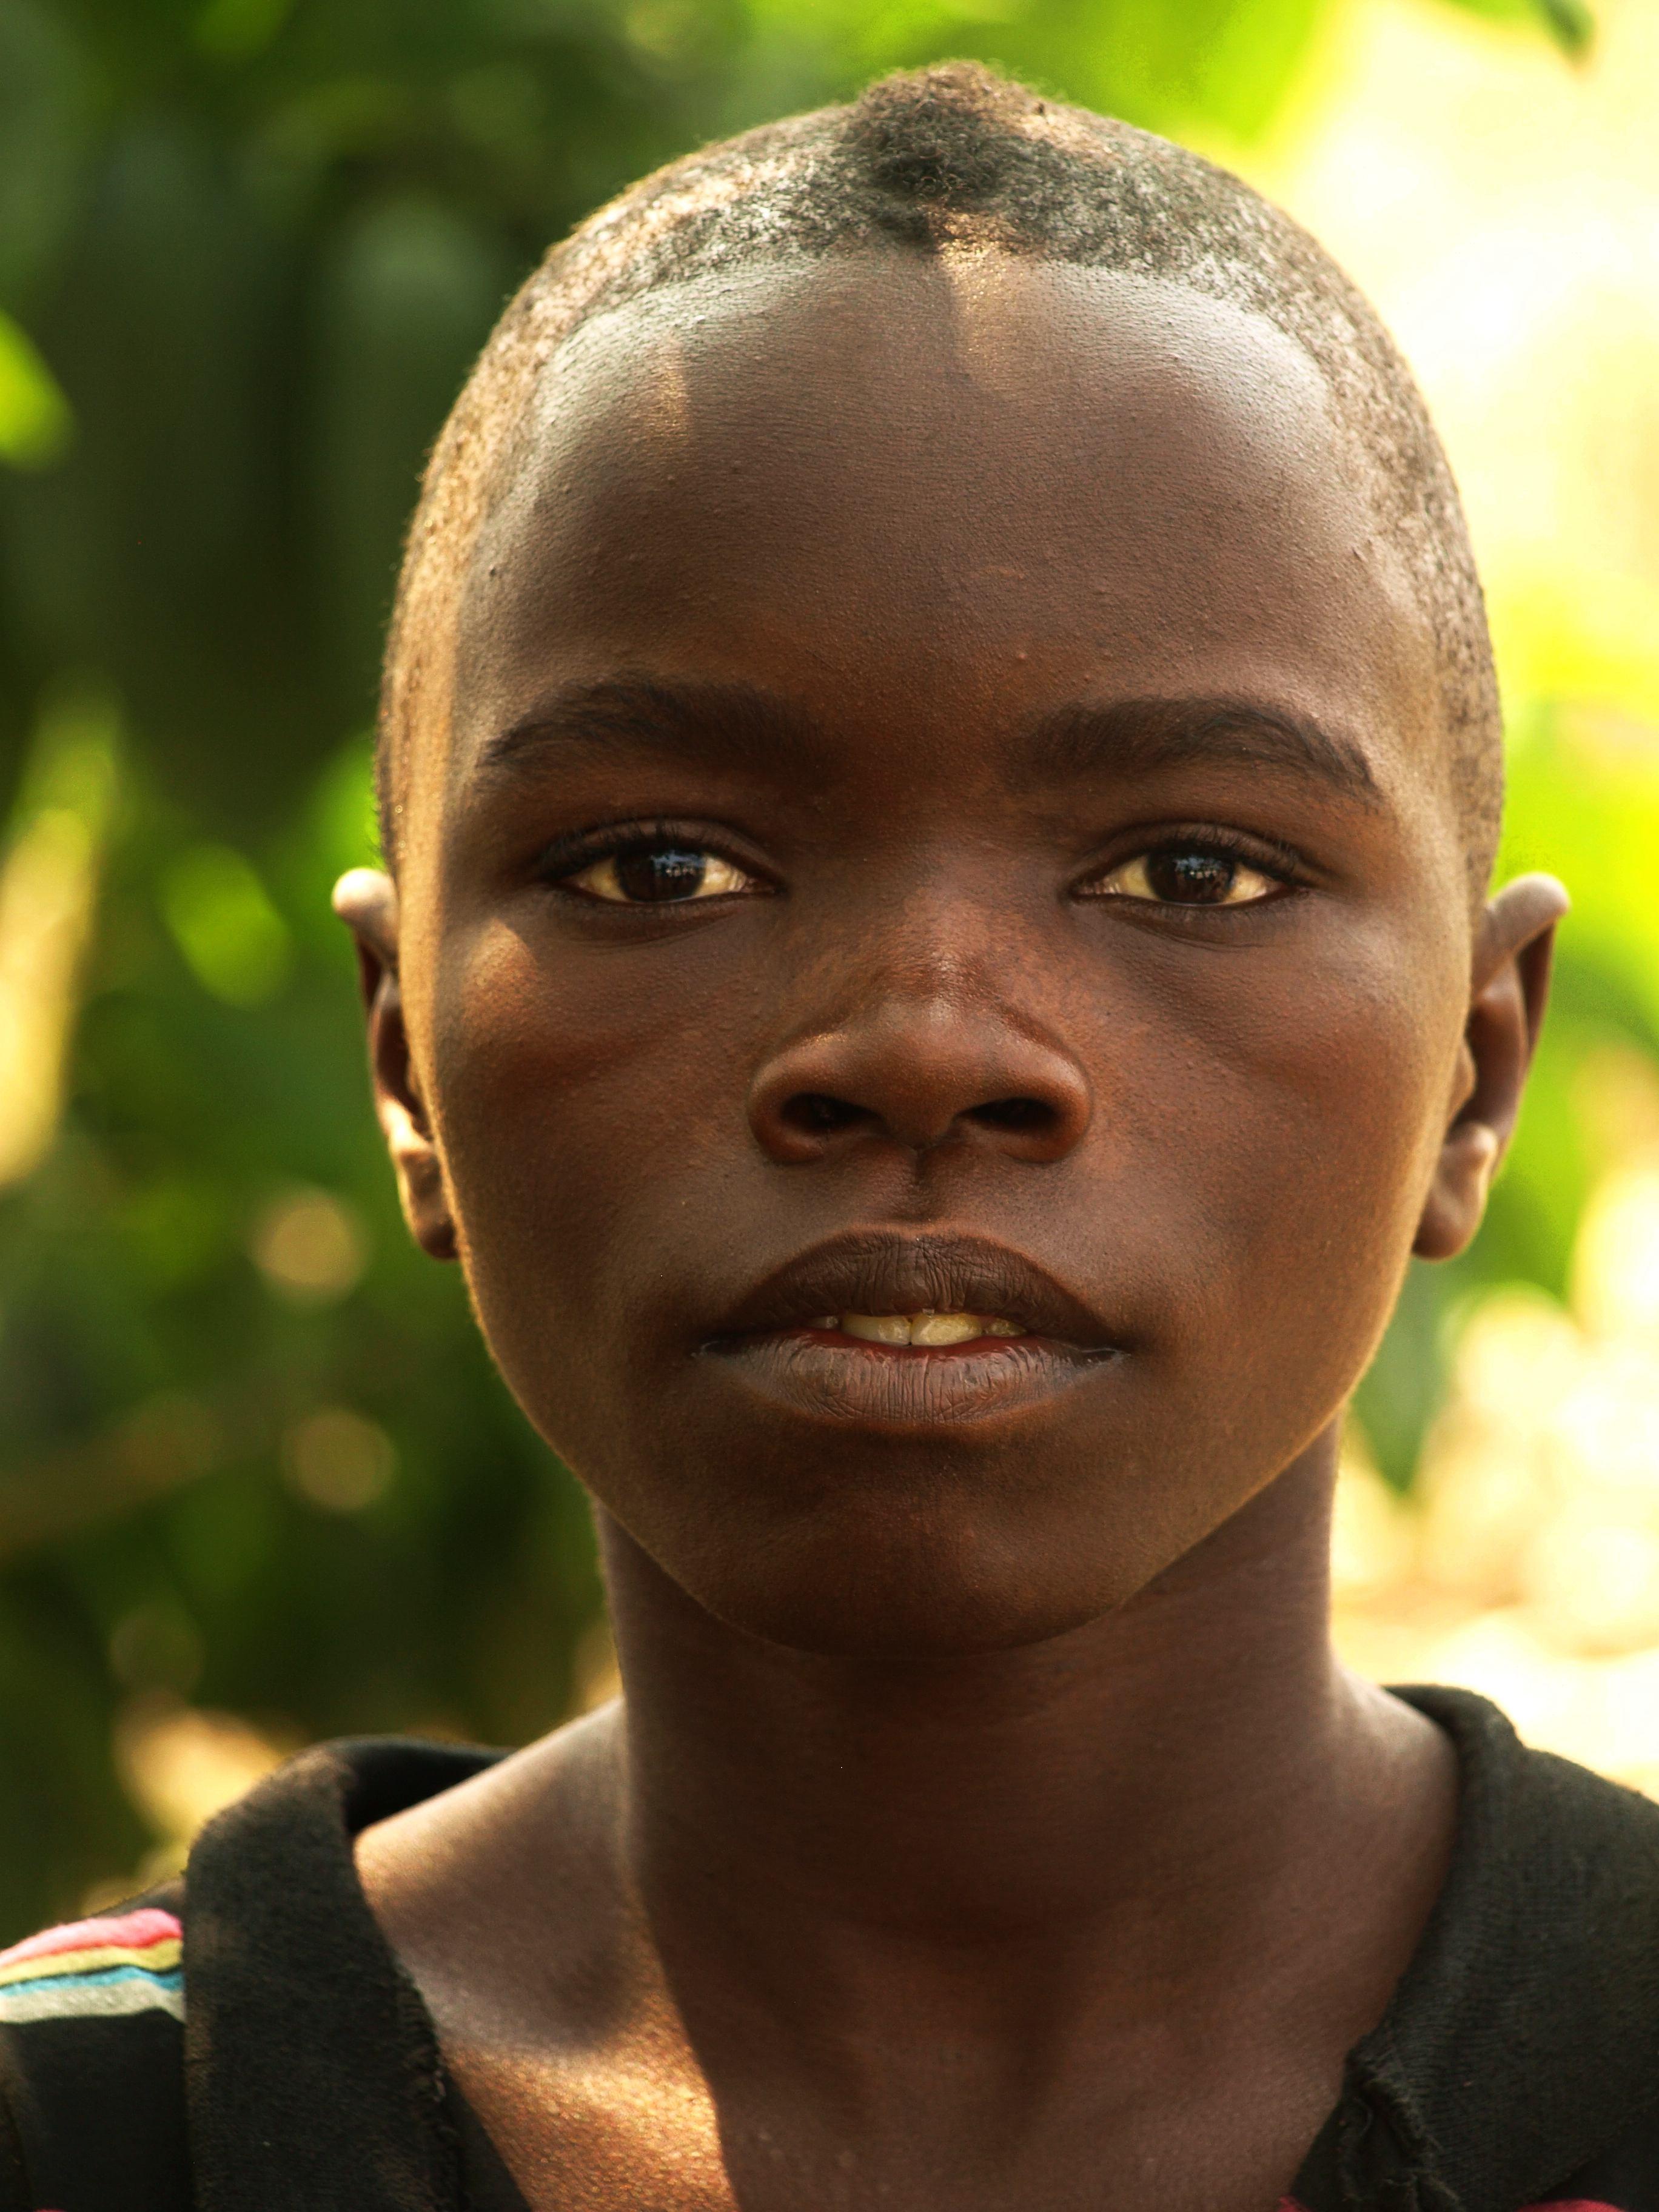 La mirada del Congo